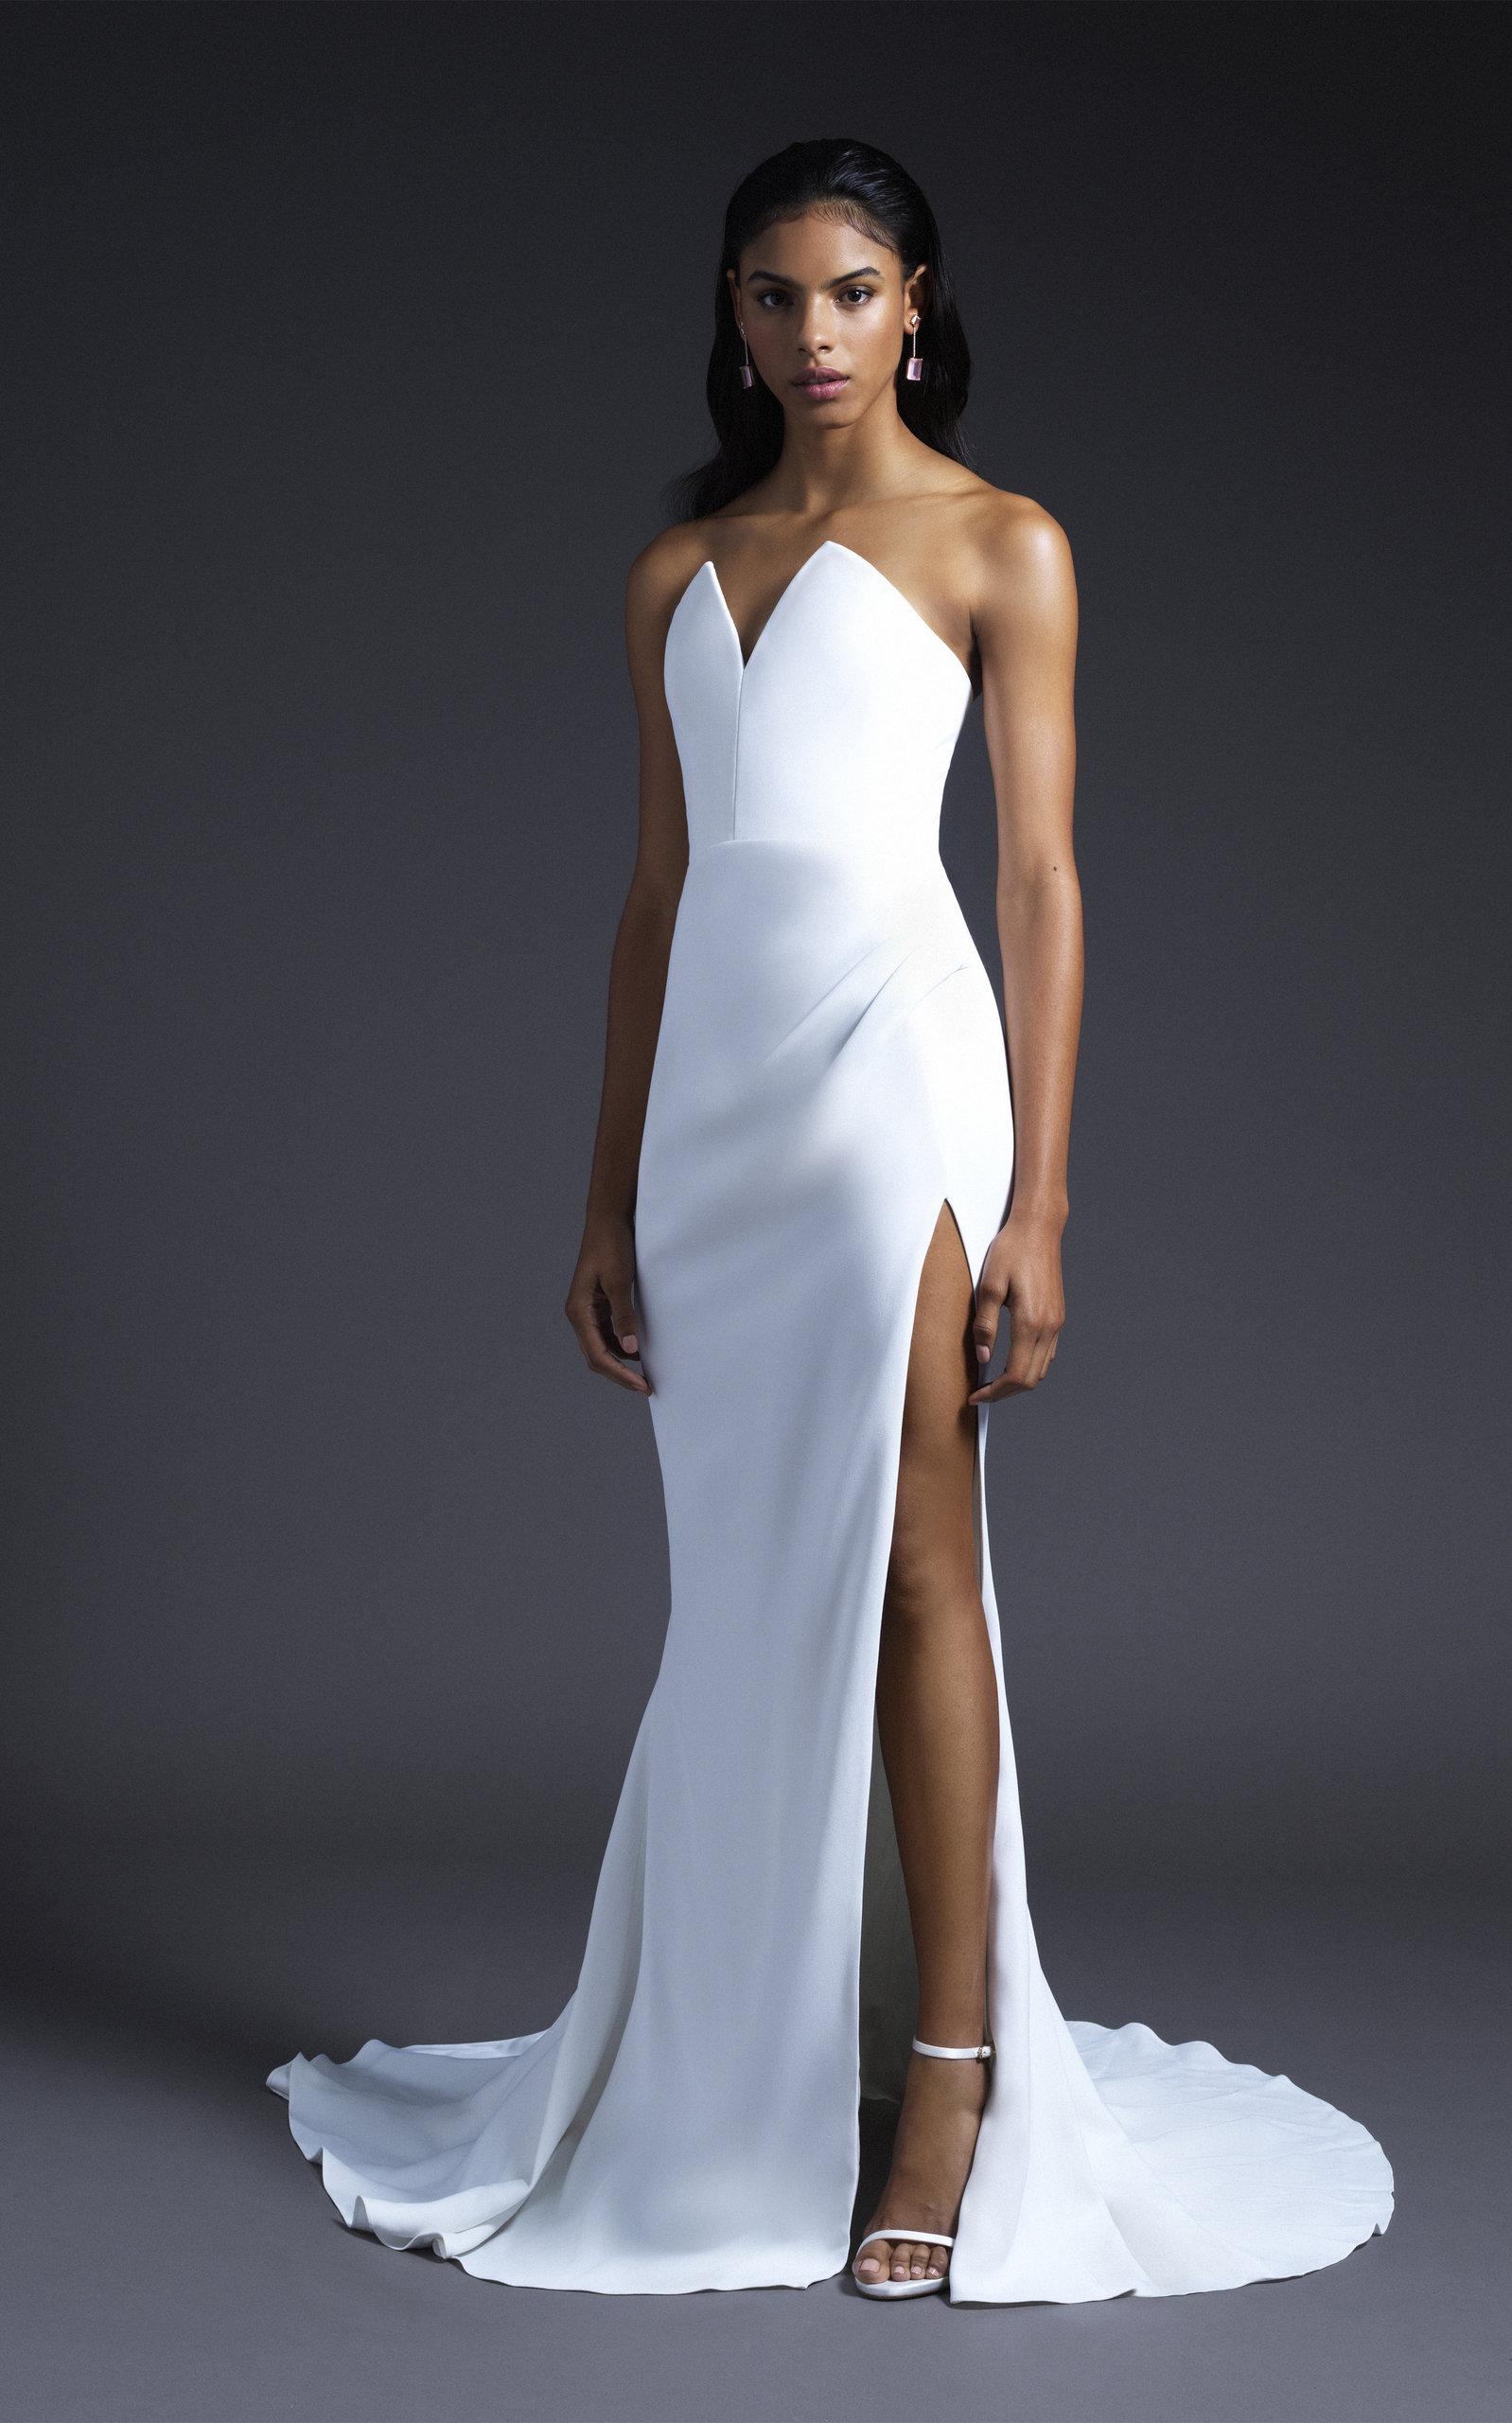 Cushnie Bridal - Bridal White Sasha Strapless Pointed Bodice Gown